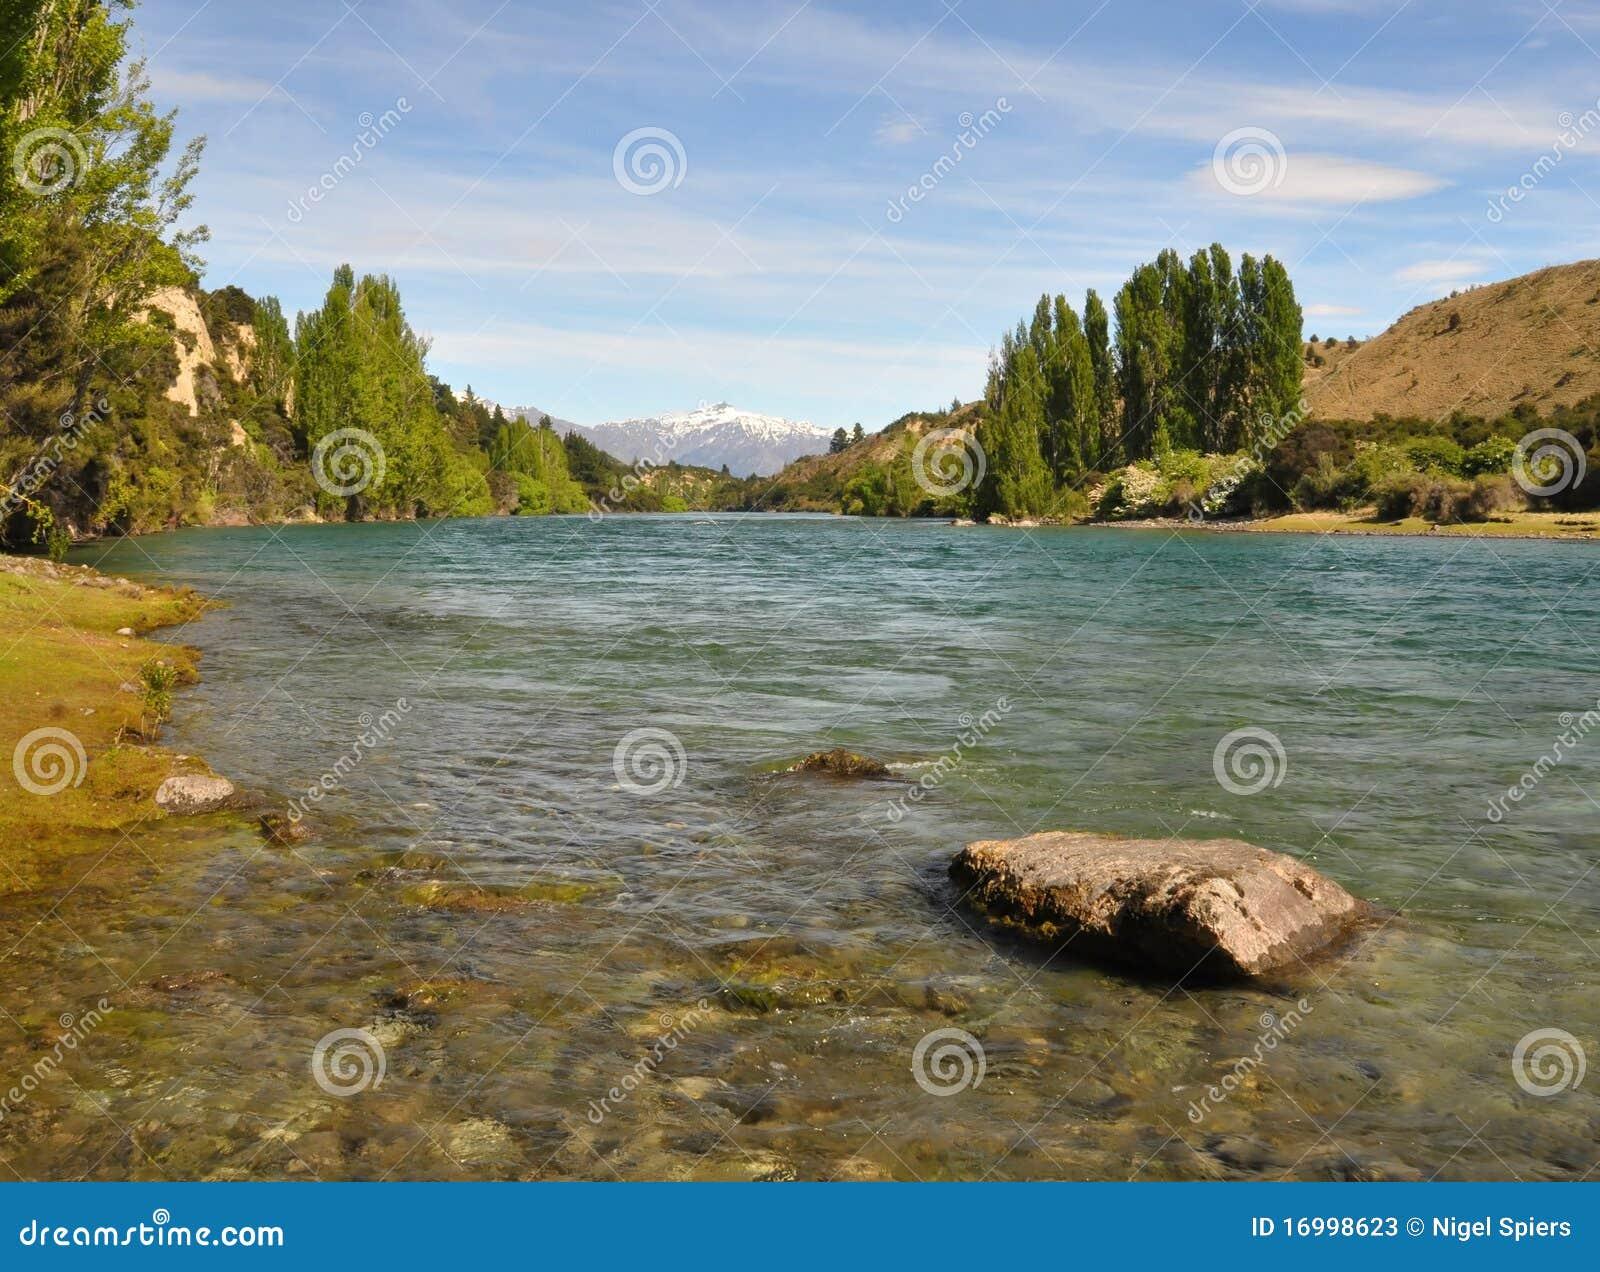 Clutha River - Wanaka, New Zealand